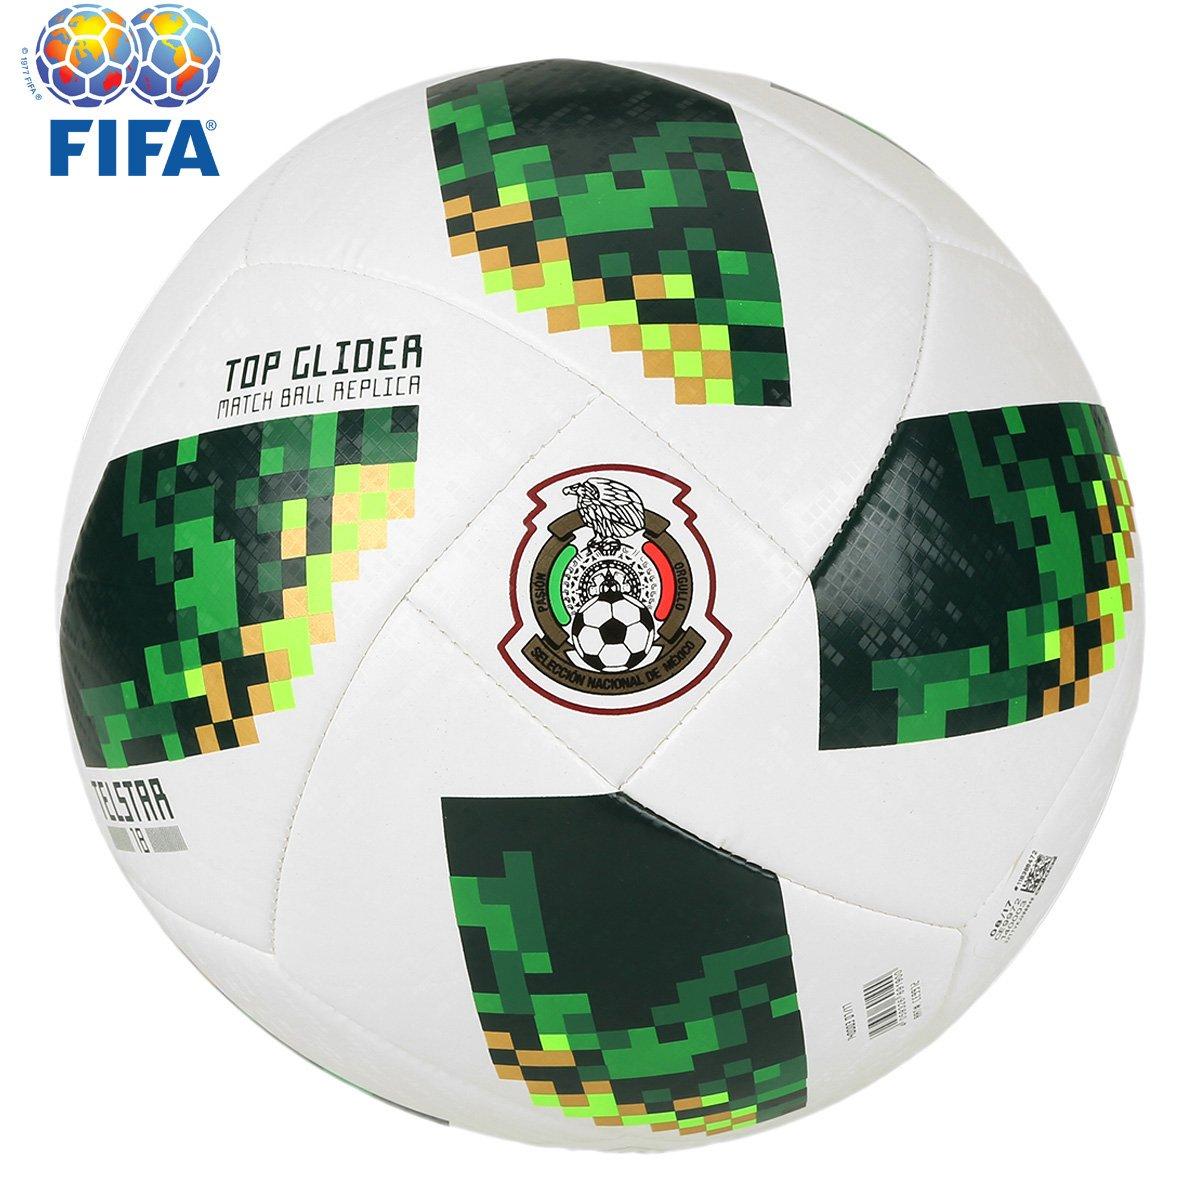 48e6c04ec615a Bola Futebol Campo Adidas Telstar 18 TOP Glider México Copa do Mundo FIFA - Compre  Agora